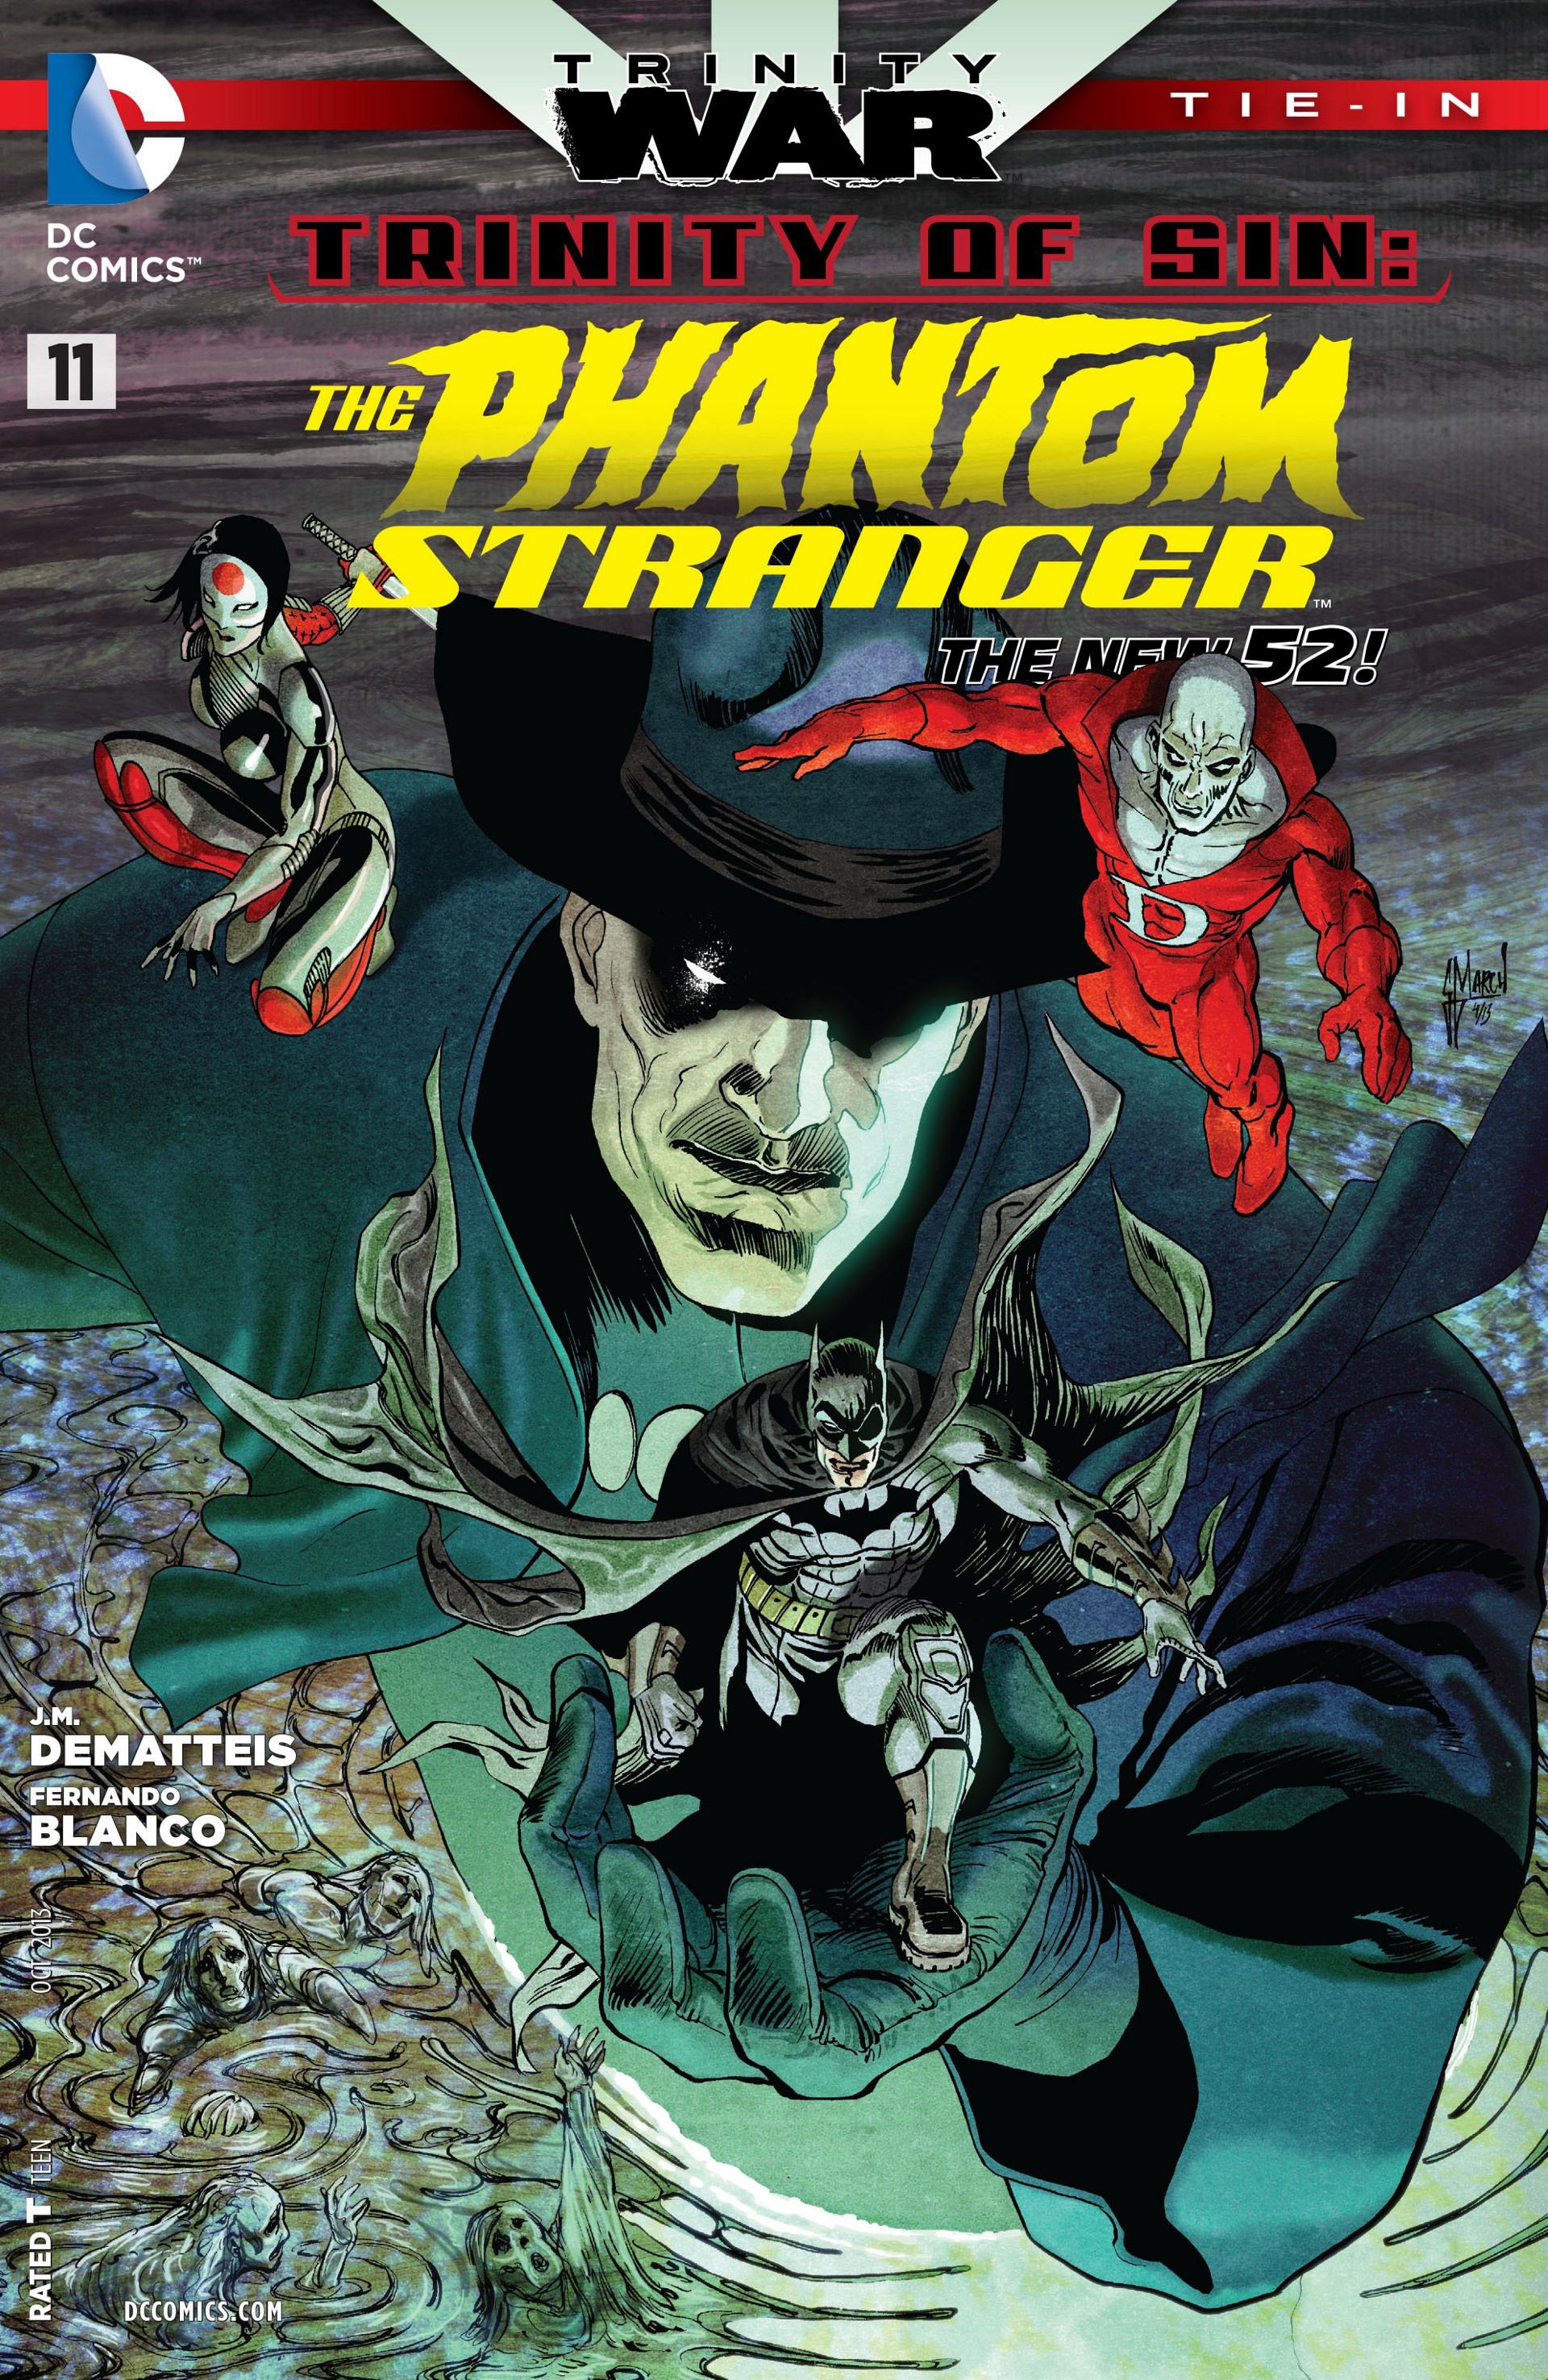 Read online Trinity of Sin: The Phantom Stranger comic -  Issue #11 - 1